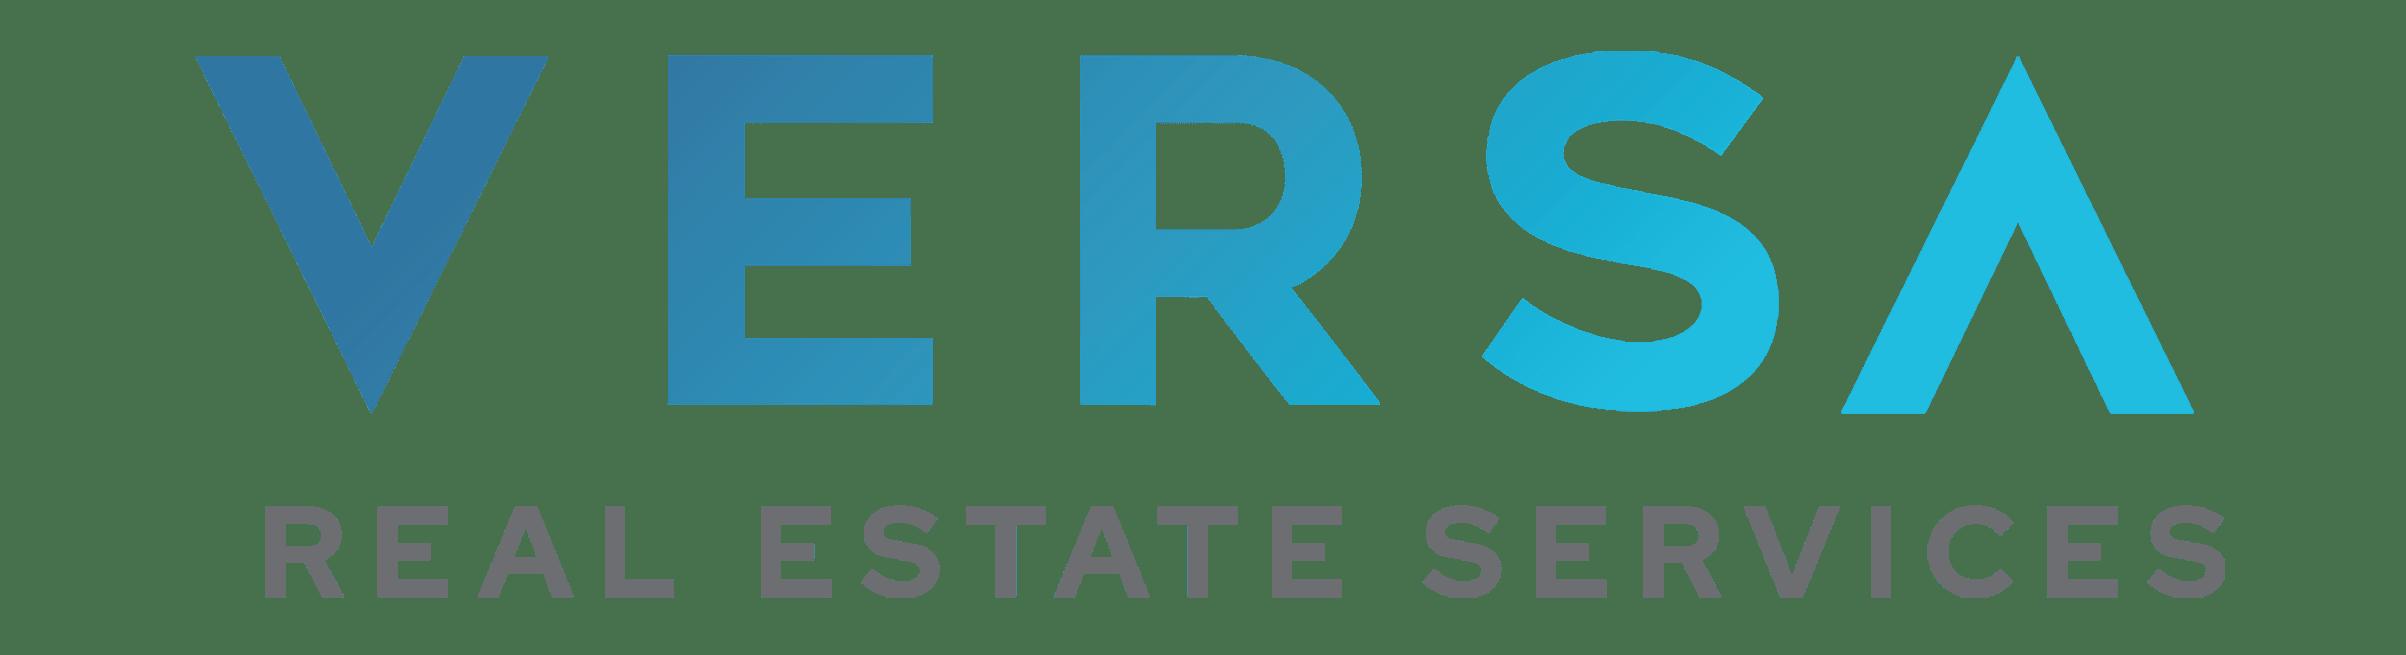 VERSA RES logo